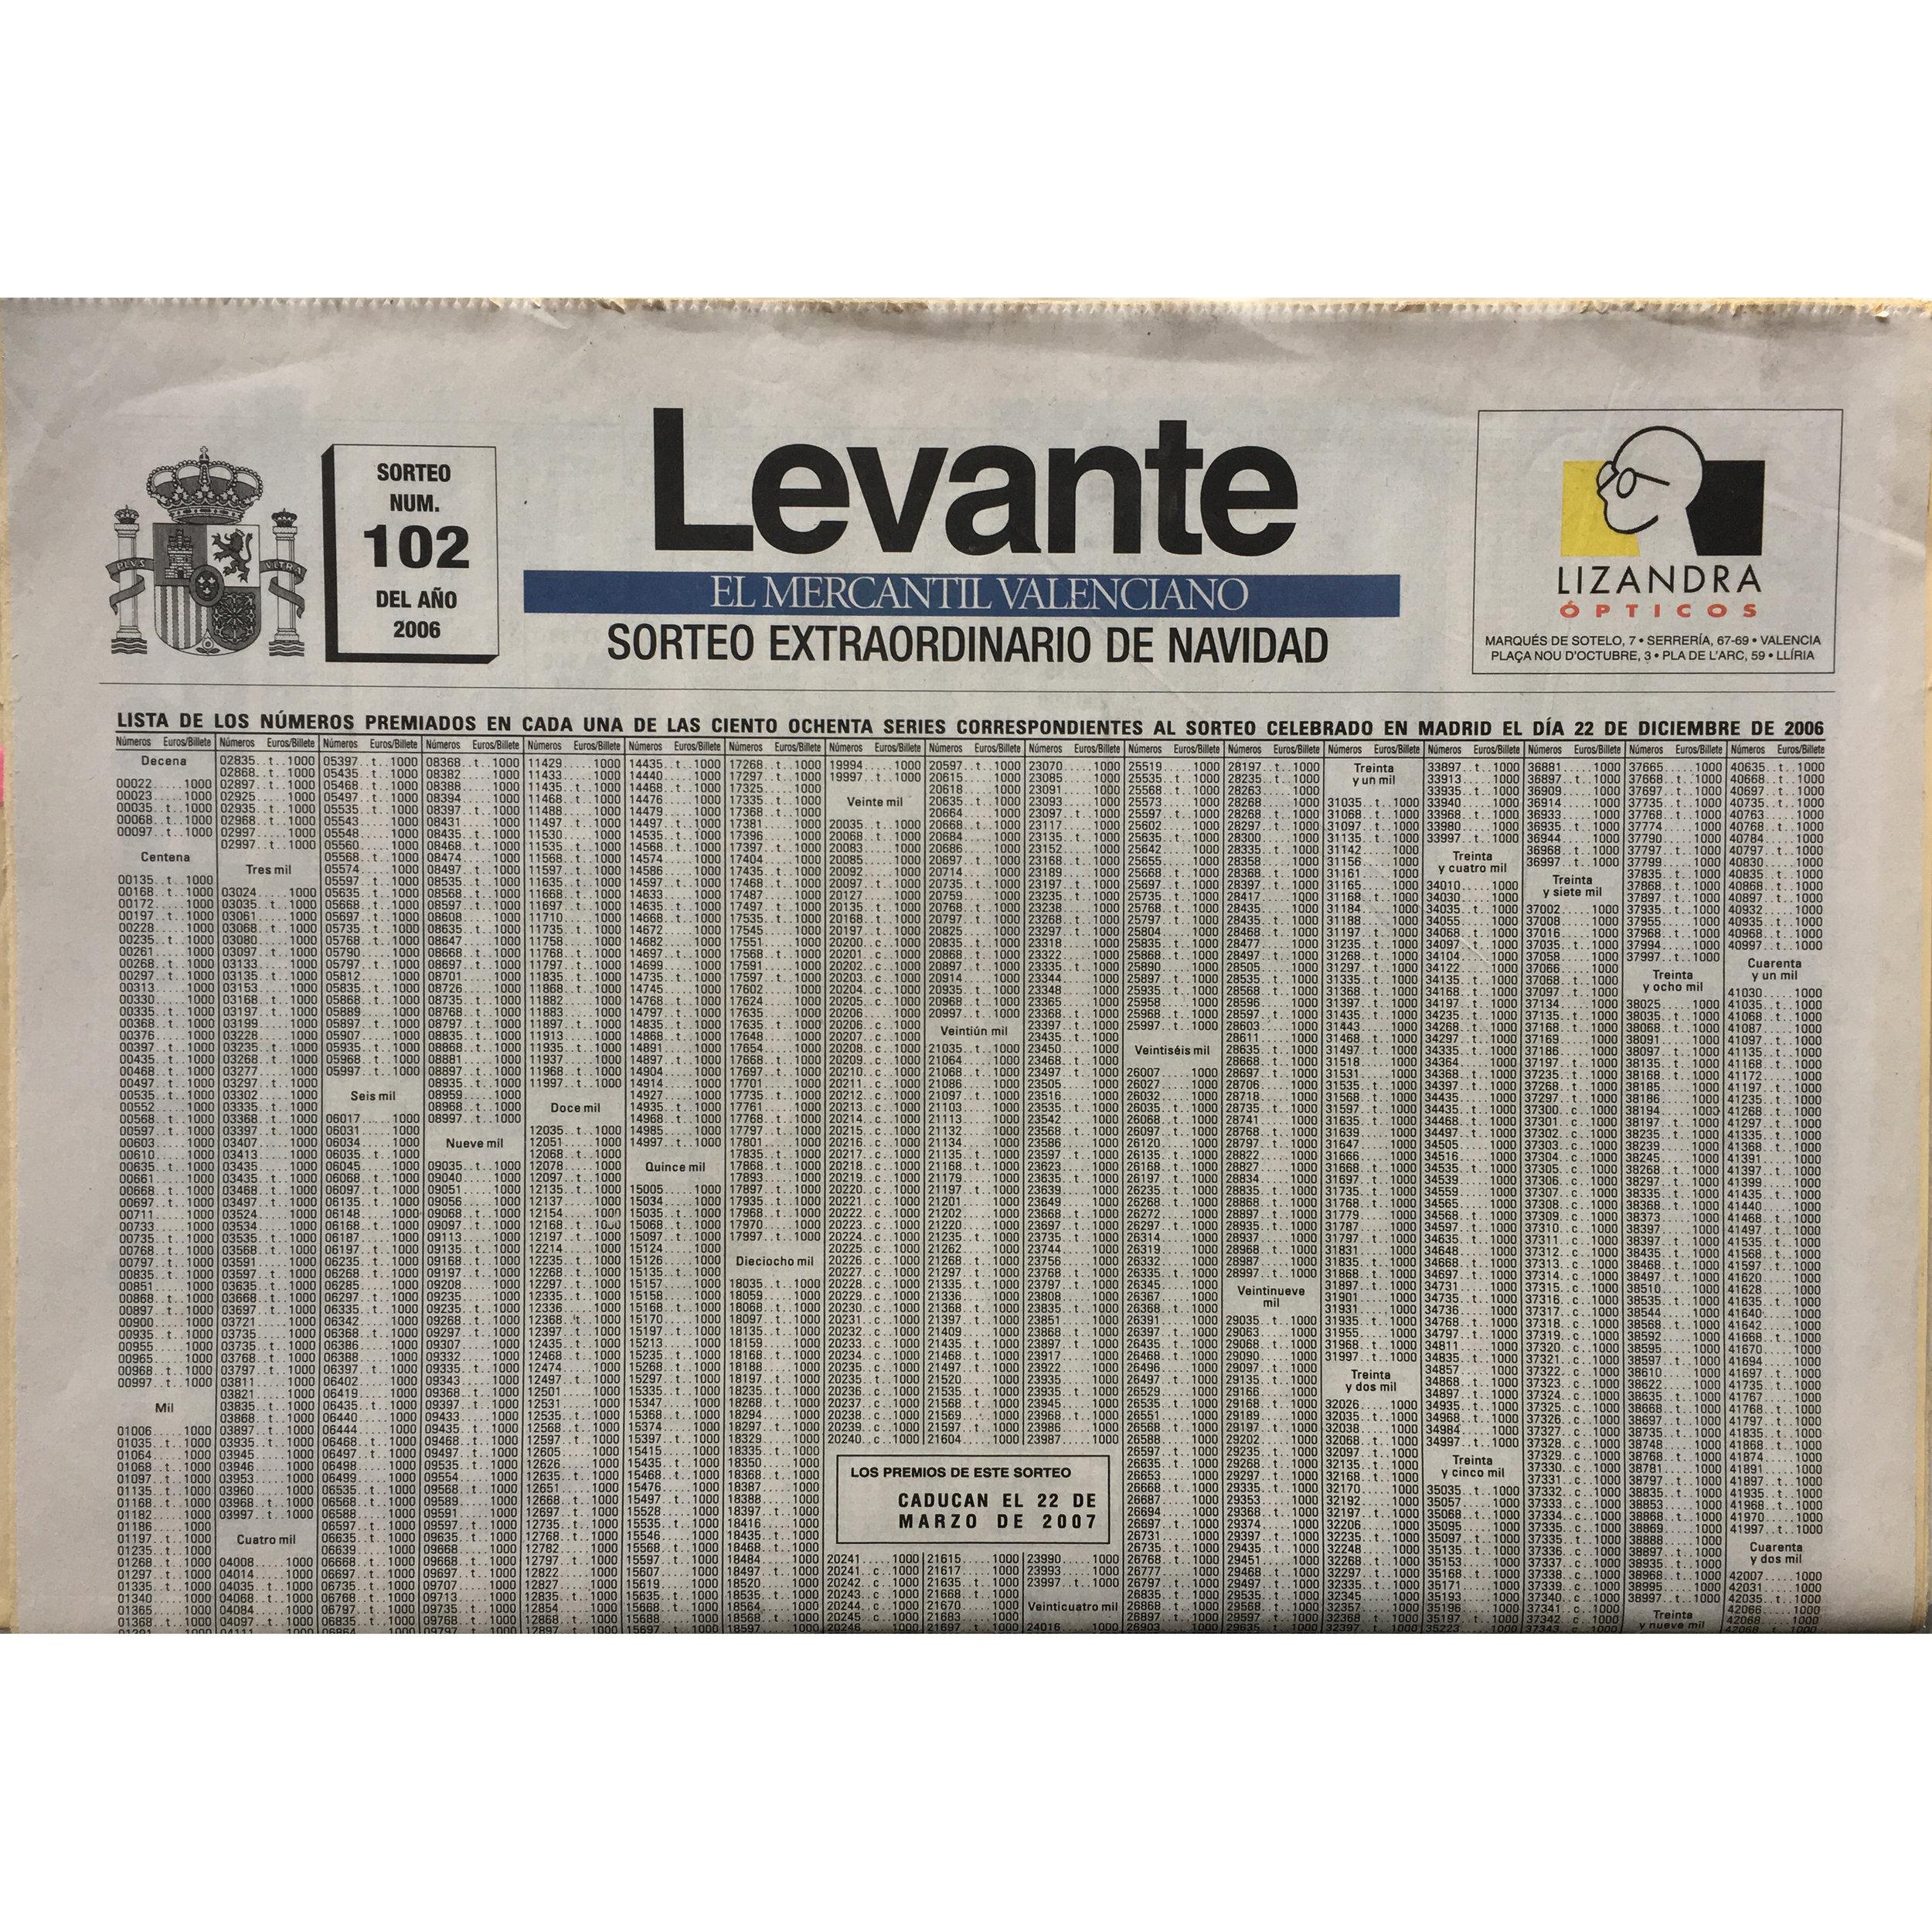 Levante. 2006 (Printed publication)